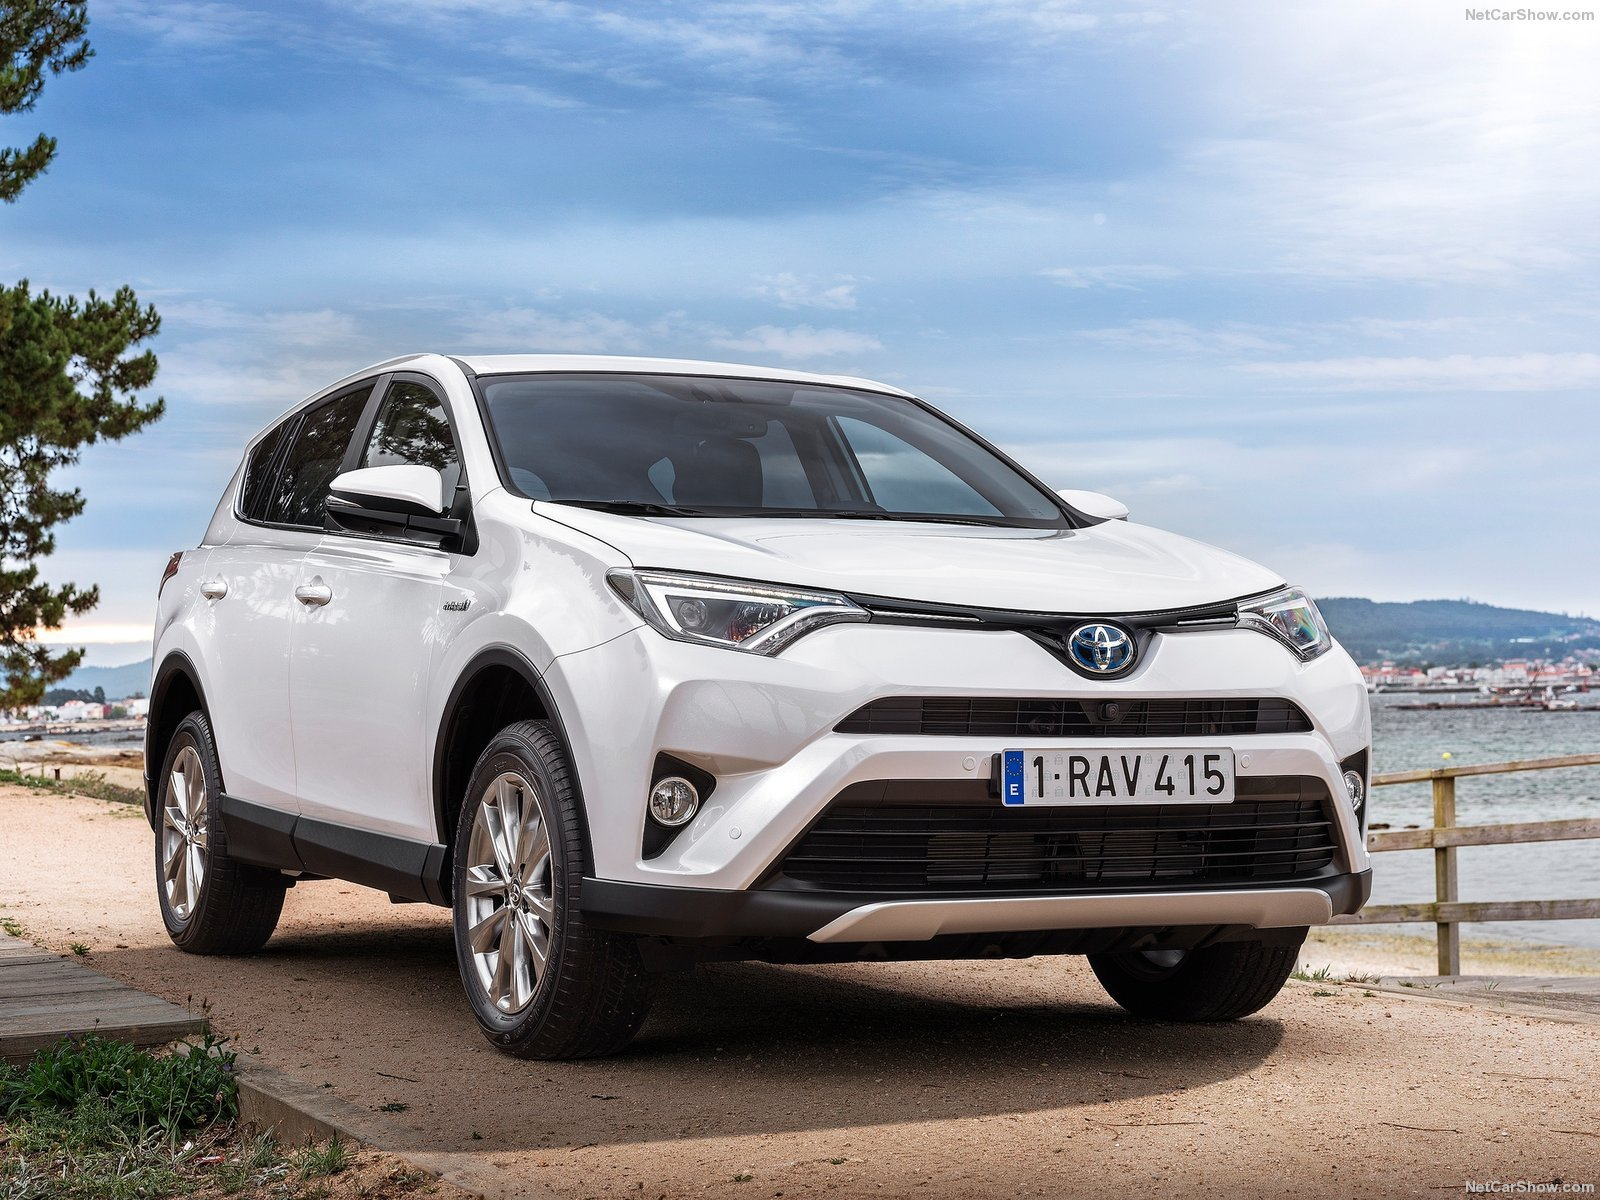 Toyota Rav4 Hybrid Eu Version Cars Suv White 2016 Wallpaper 1600x1200 805030 Wallpaperup